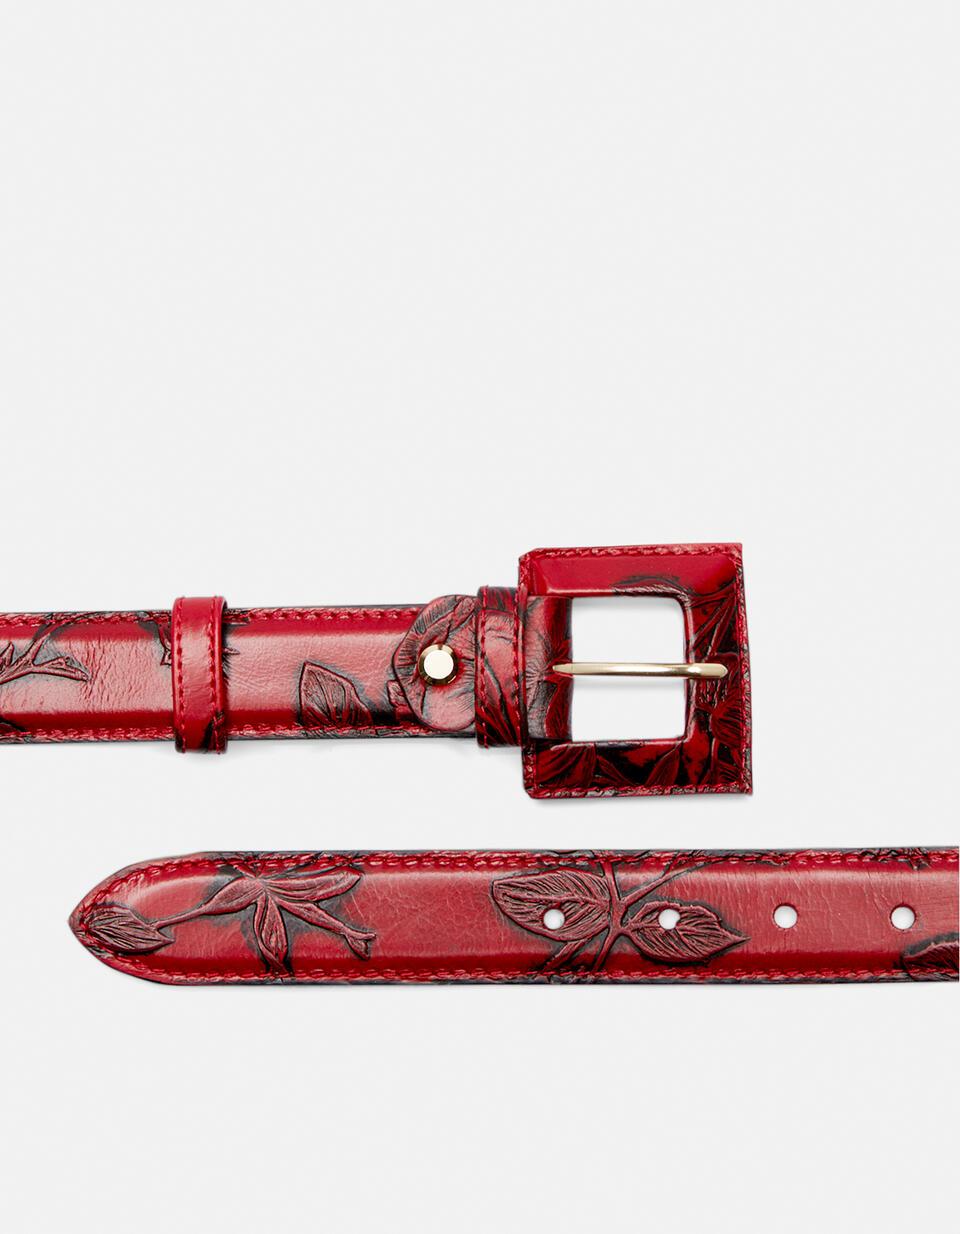 Cintura Mimì da donna media in pelle stampata a rose con fibbia fasciata ROSSO Cuoieria Fiorentina